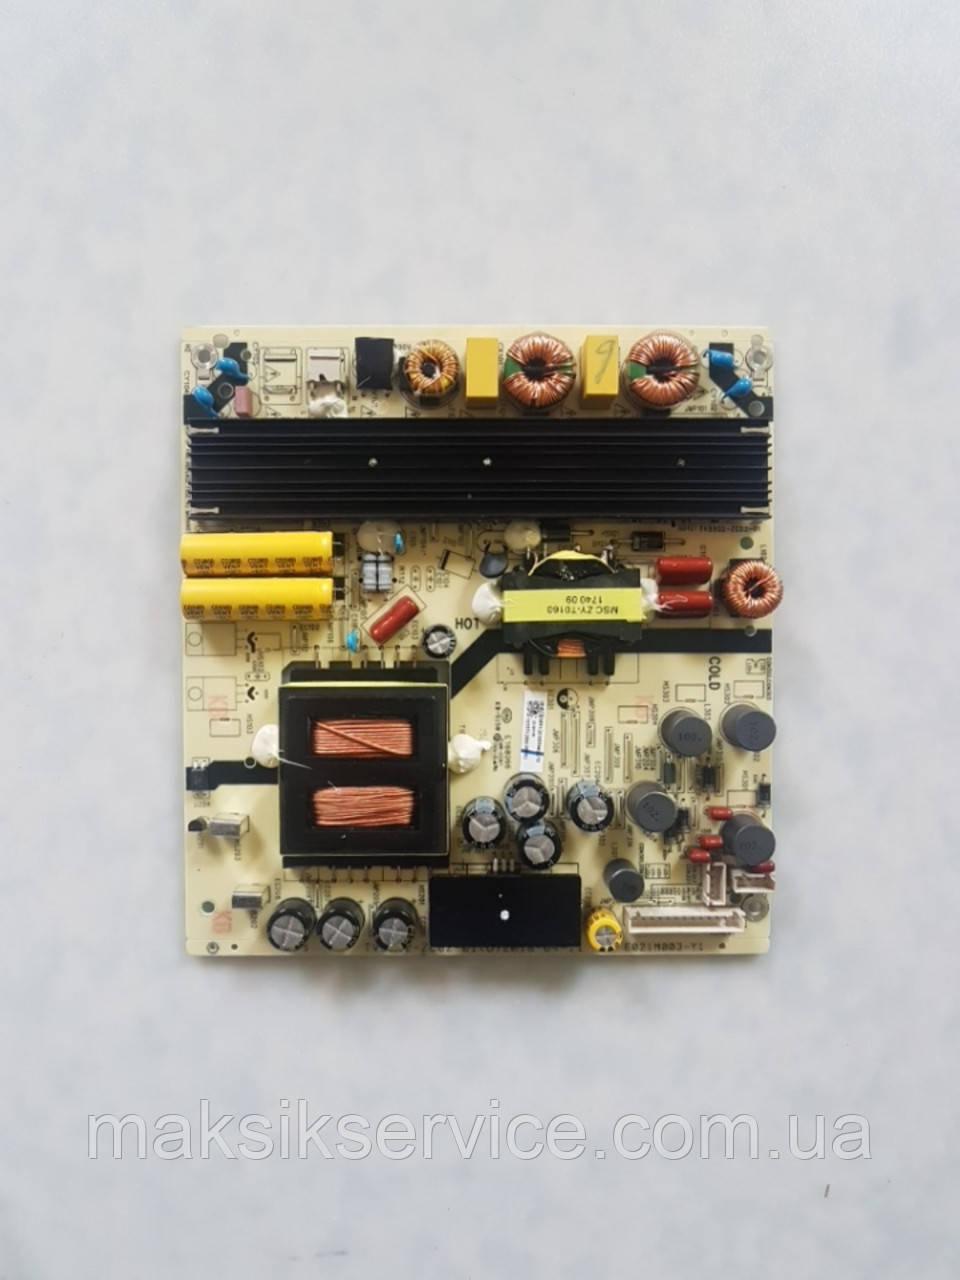 Блок питания TV5502-ZC02-01 E021M003-Y1 Kivi 55UR50GU